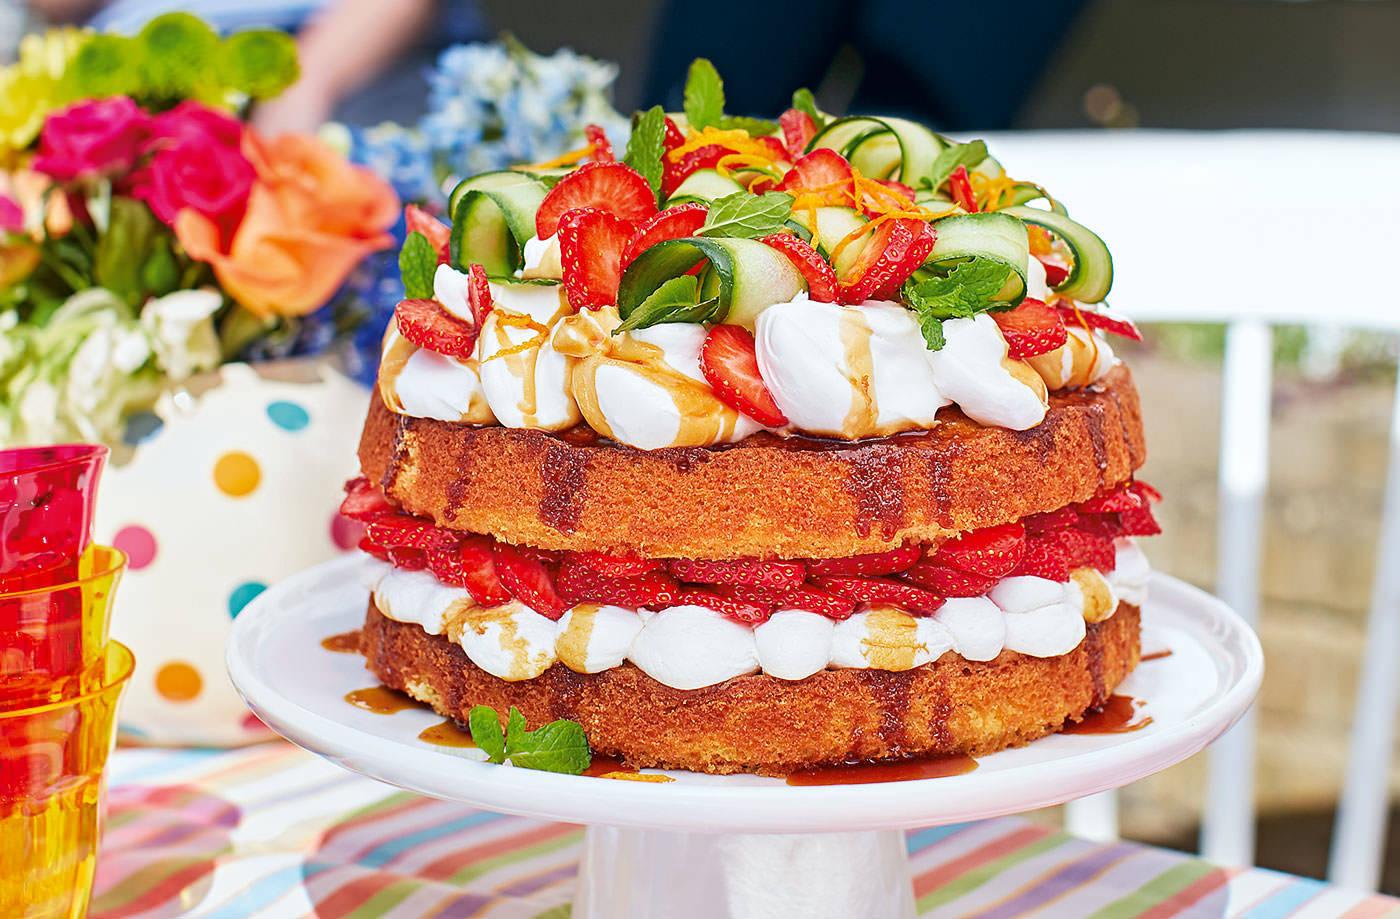 Pimms-layer-cake-1400x919-mini-abf37c54-93a0-4a38-b702-7dad5d02637b-0-1400x919.jpg